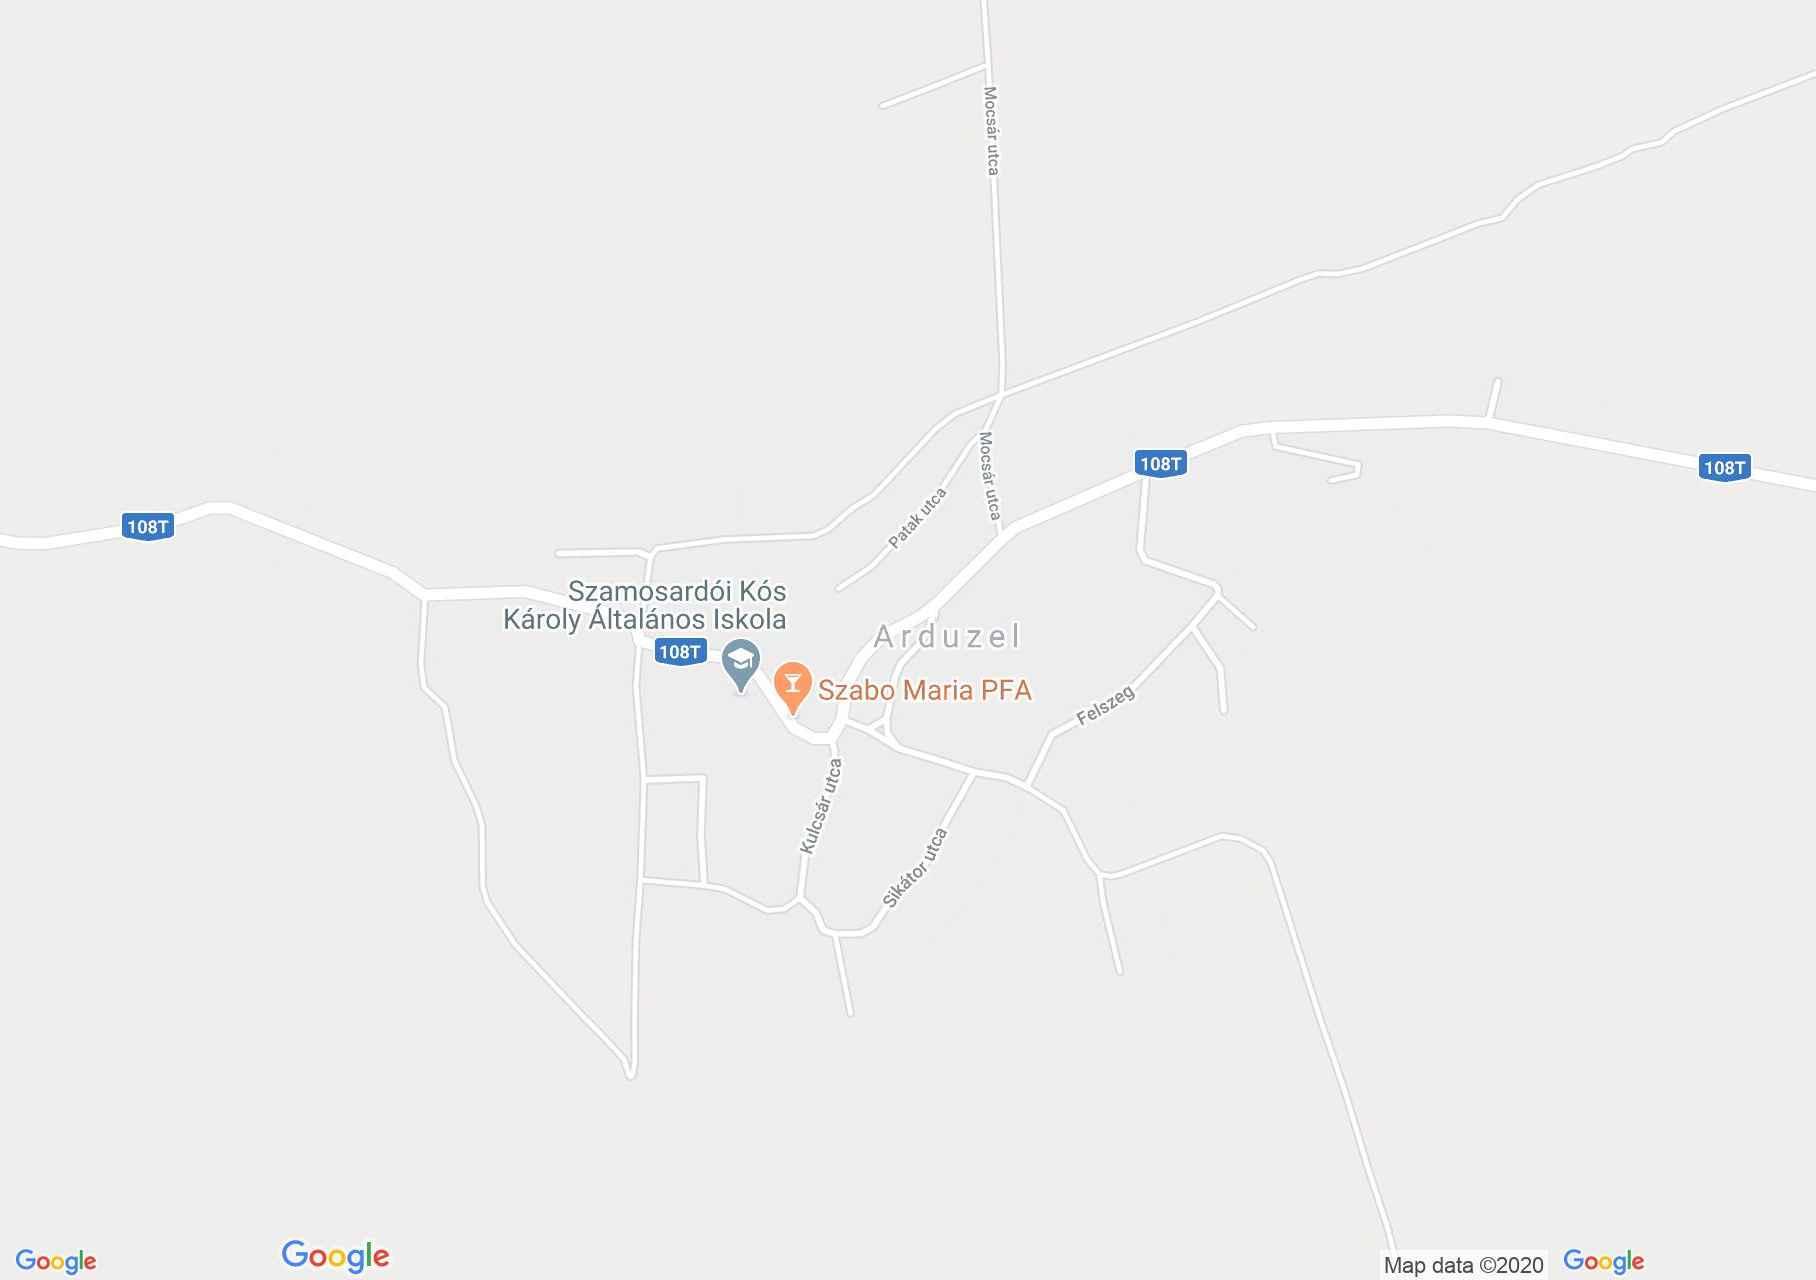 Arduzel, Interactive tourist map